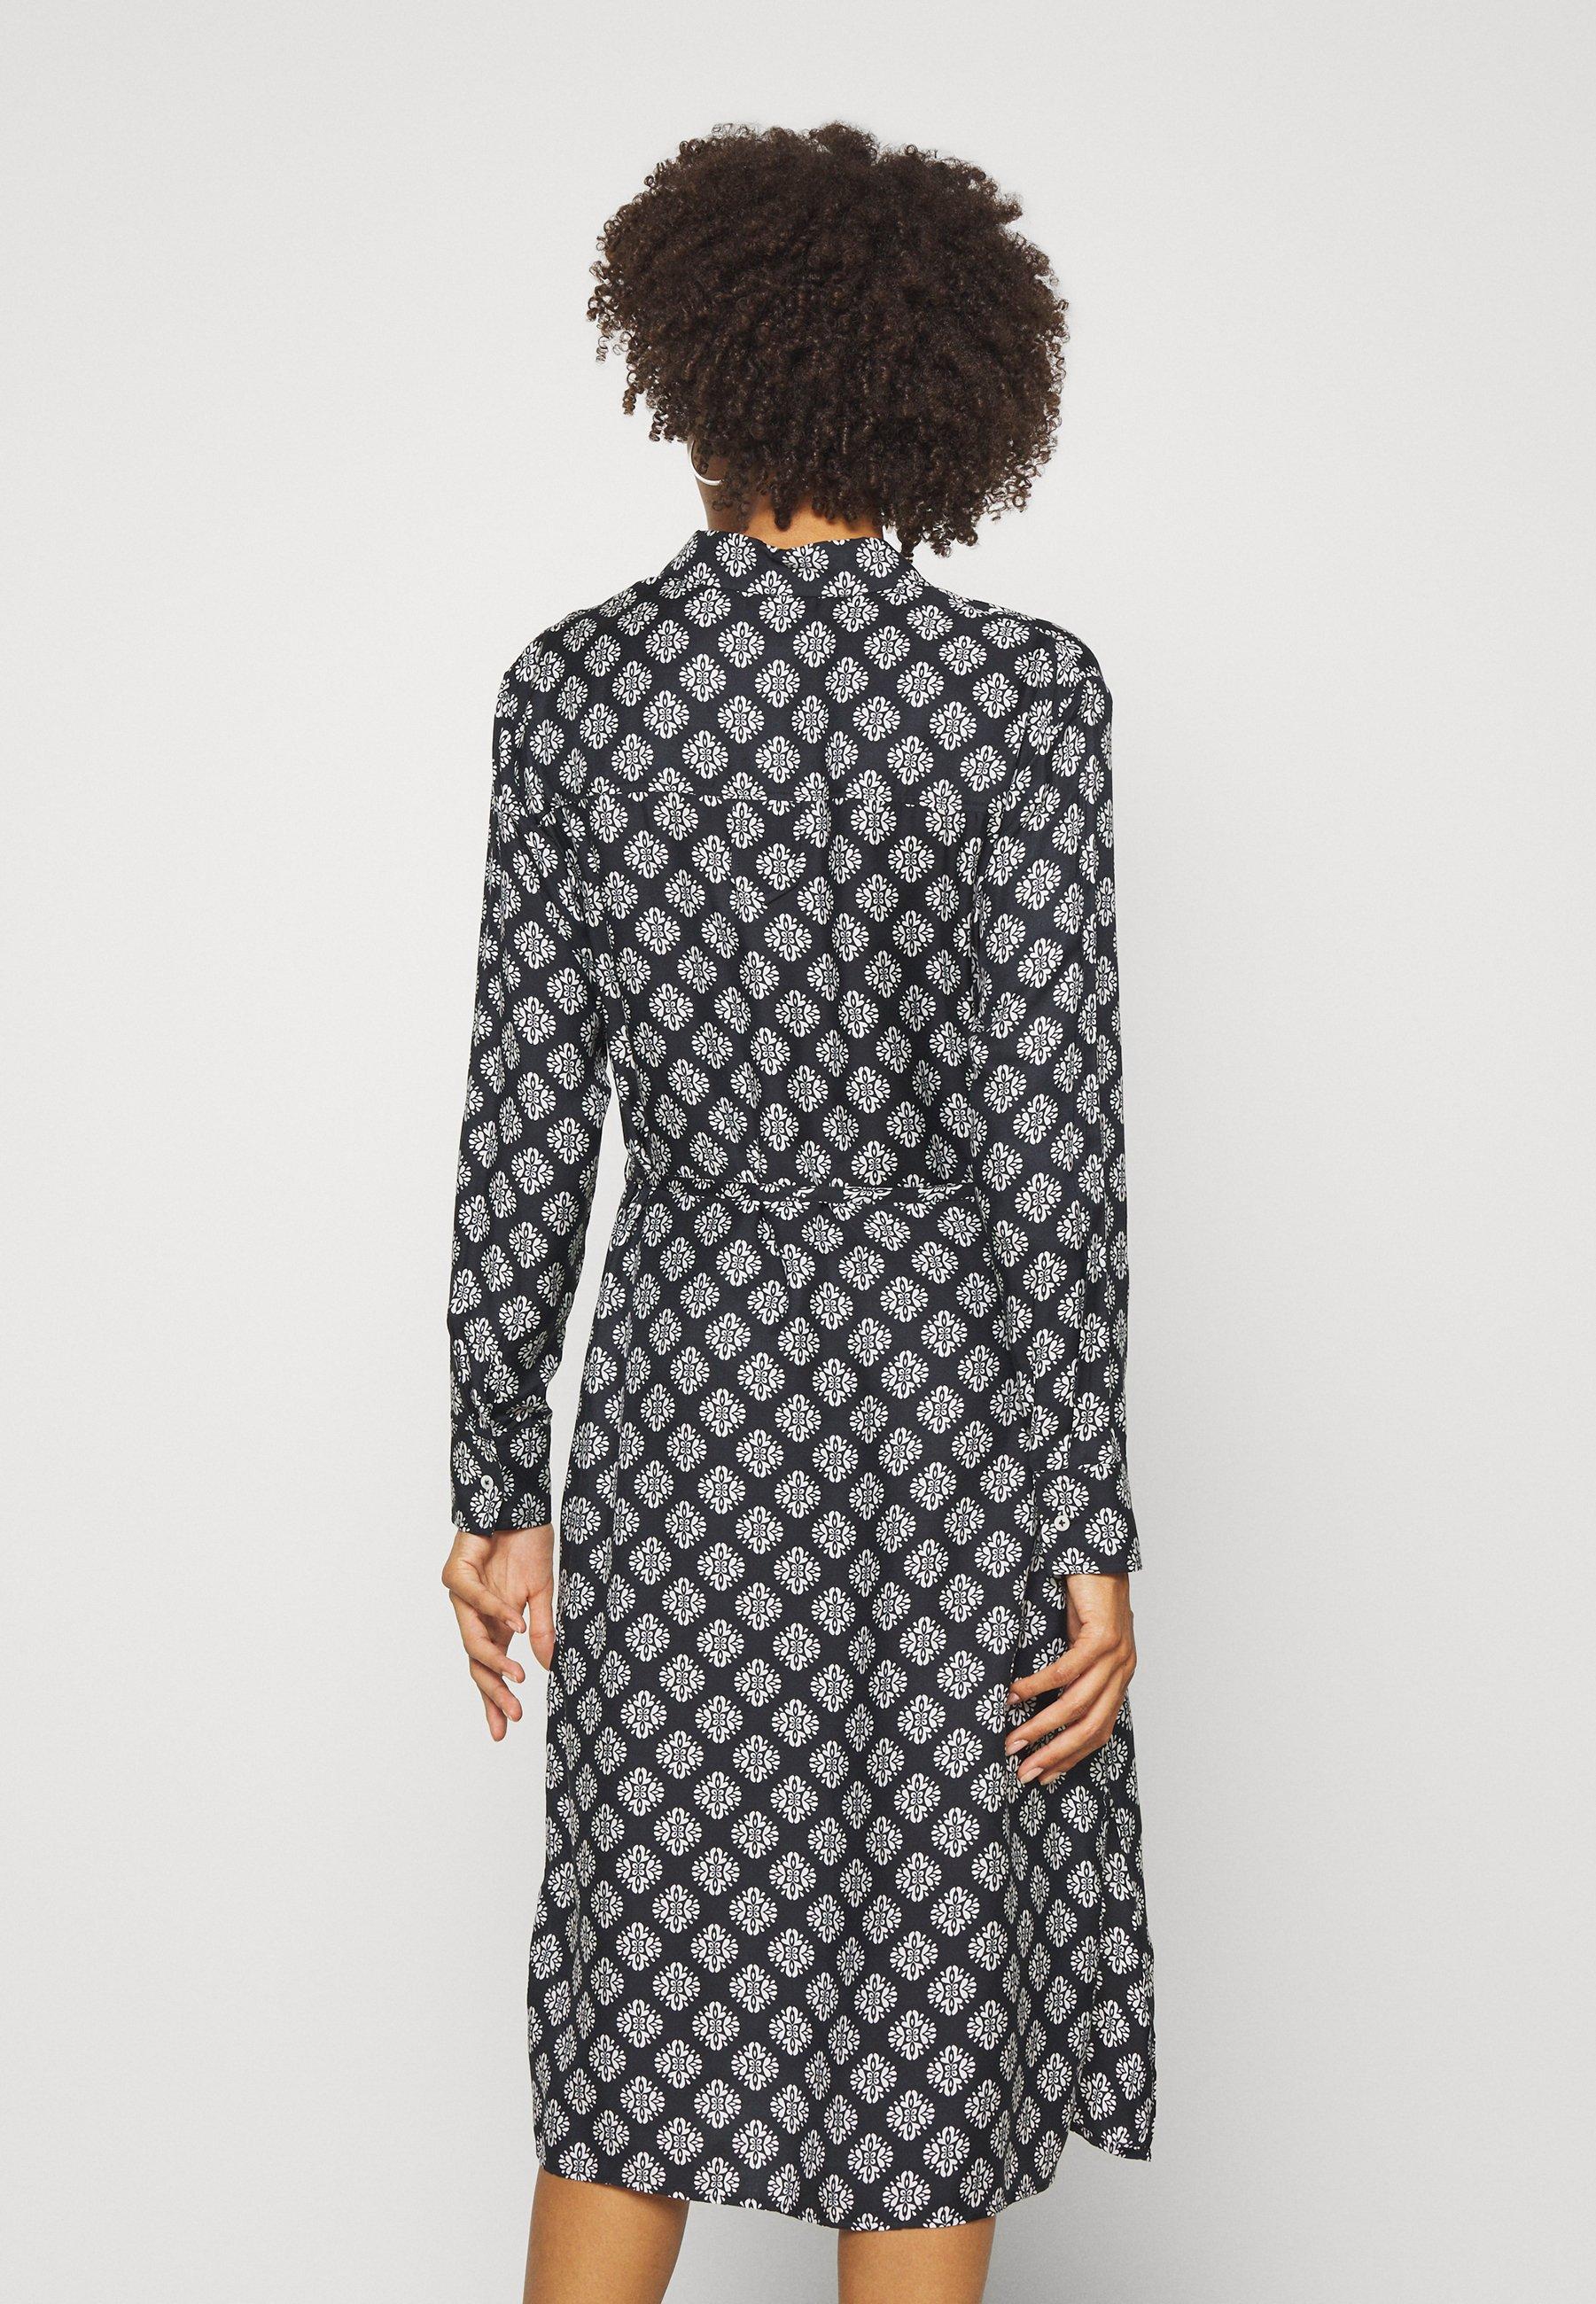 Marc O'Polo DRESS STYLE BREAST POCKET SMALL BELT PRINTED Blusenkleid black/schwarz